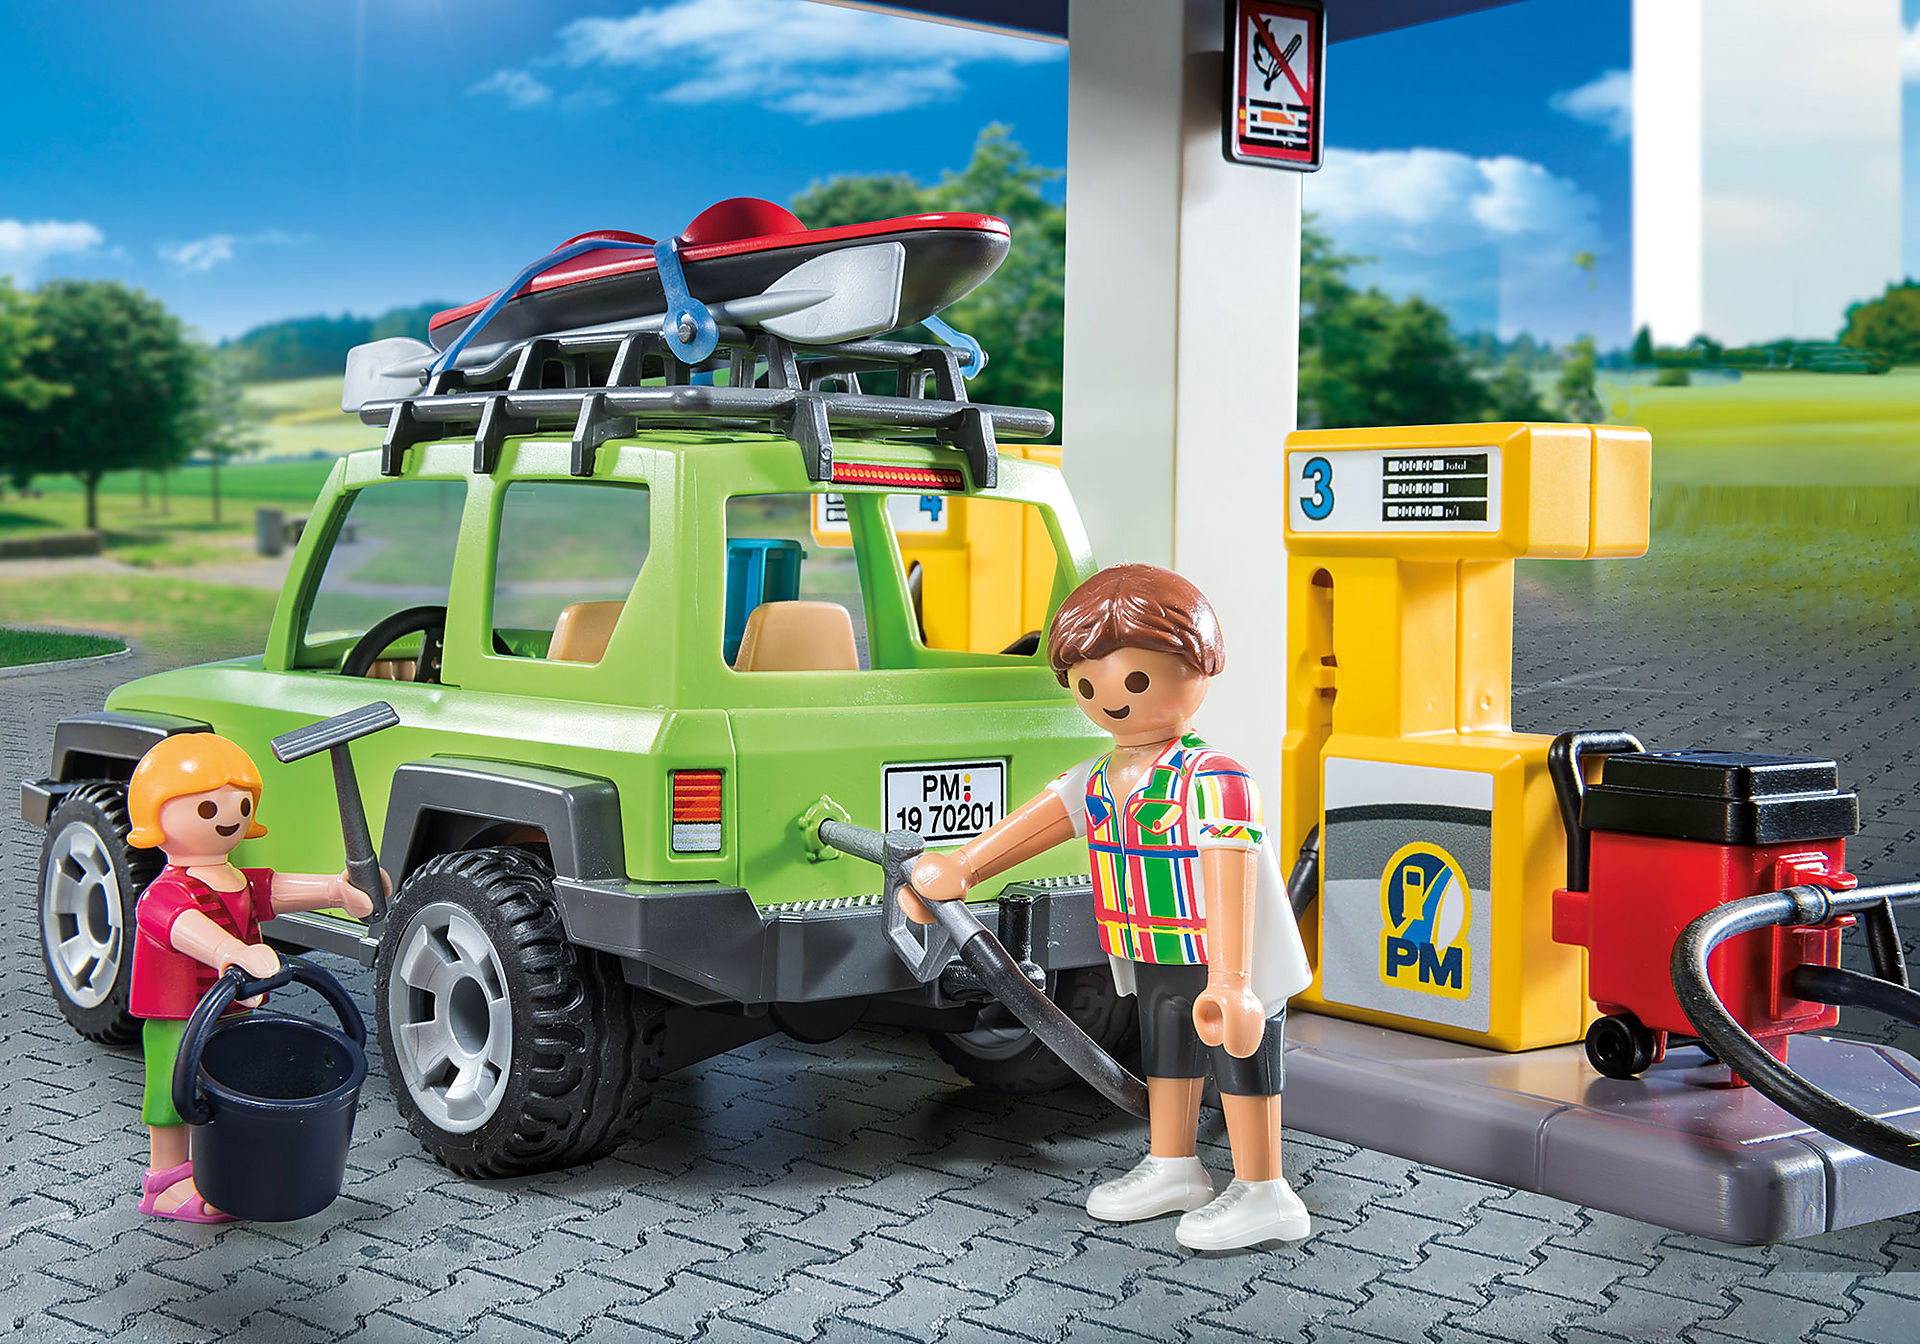 http://media.playmobil.com/i/playmobil/70201_product_extra4/Station service